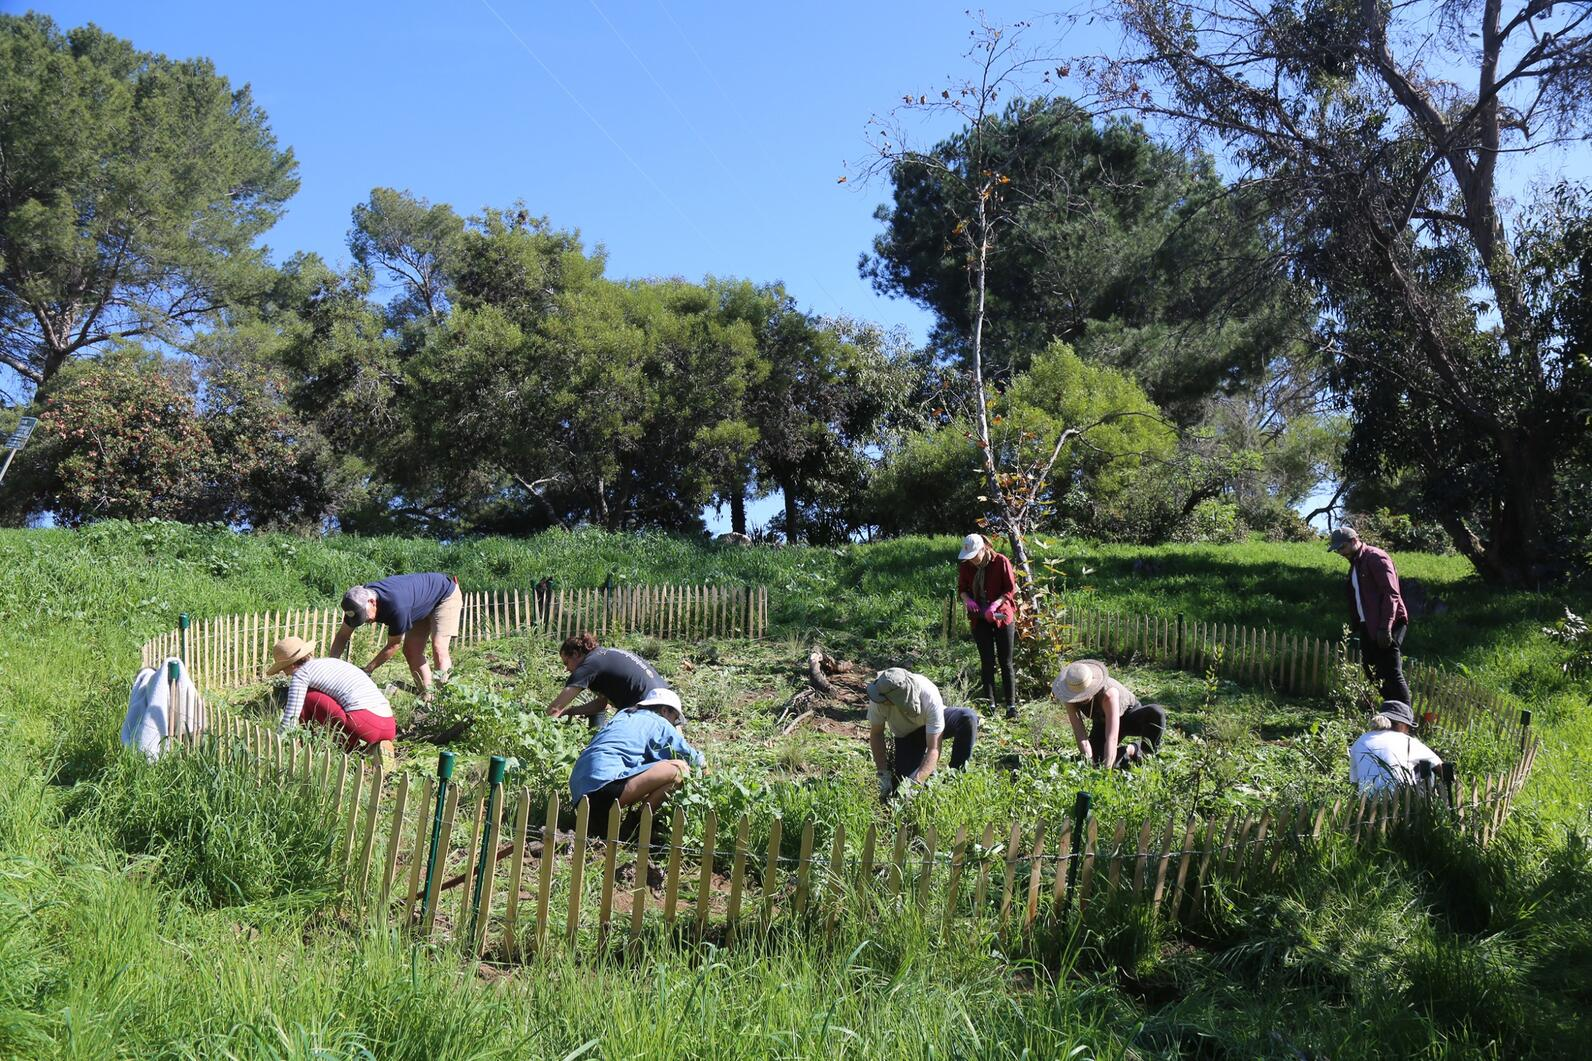 Community volunteers installing plants at Elysian Park, Winter 2019